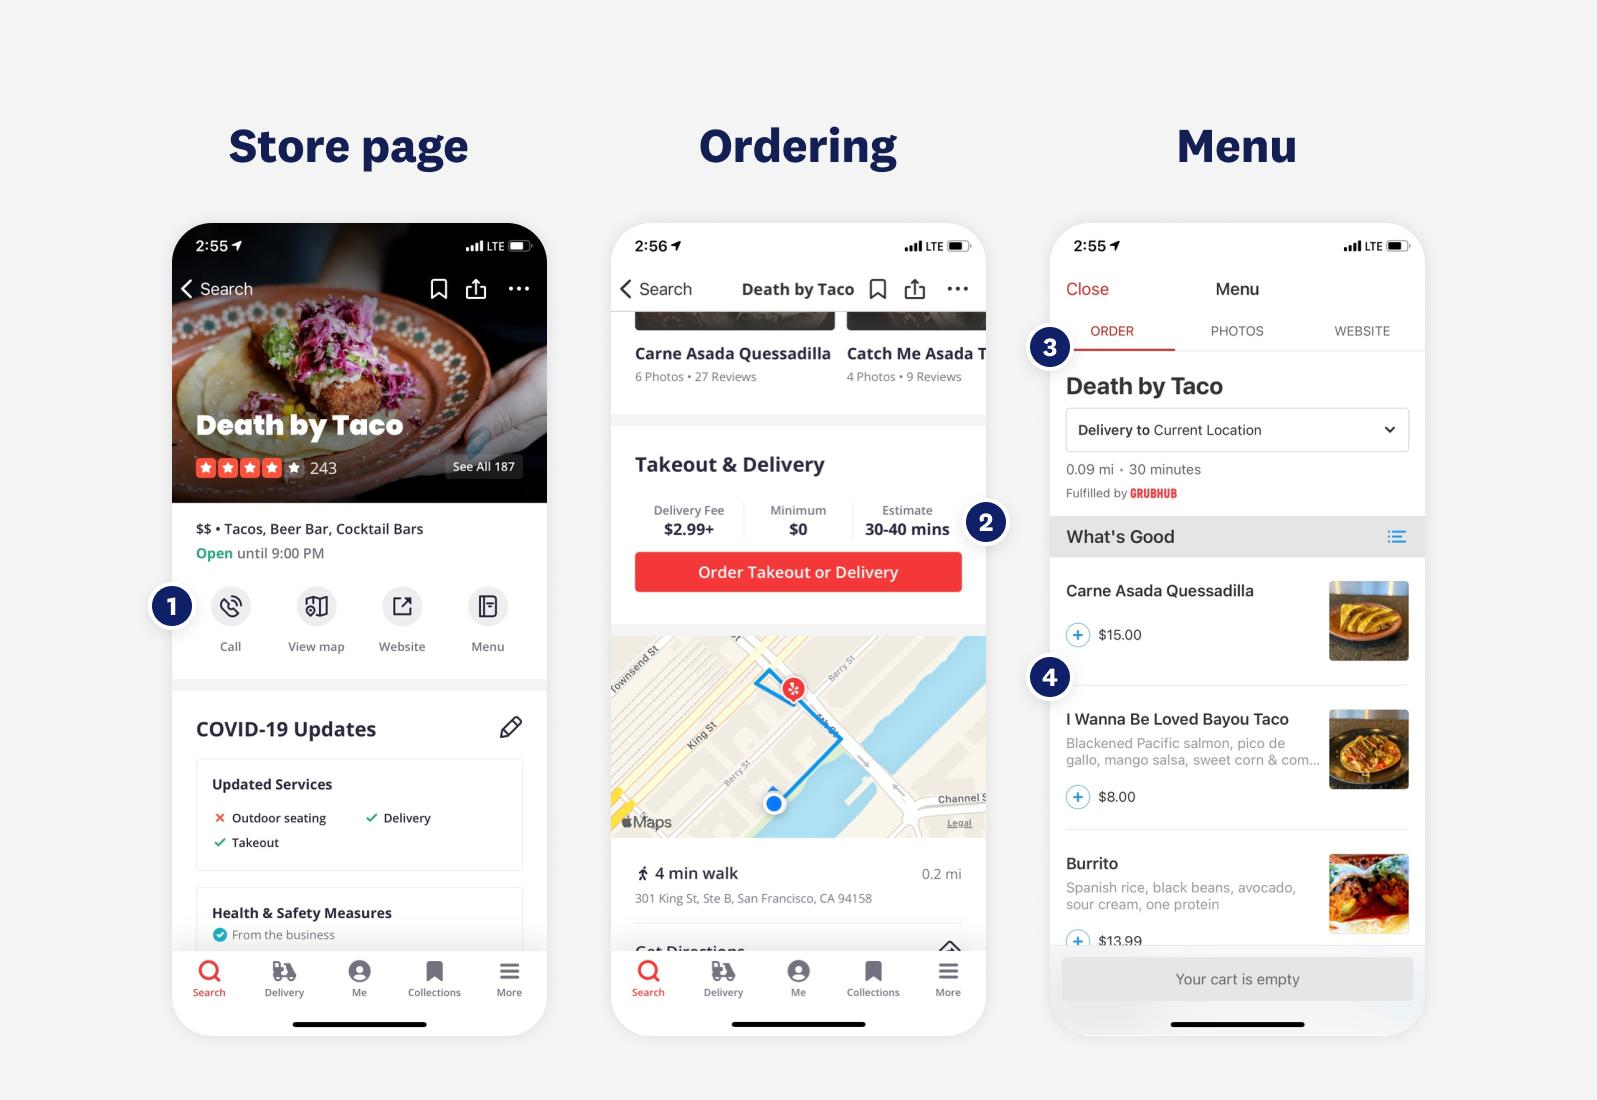 choosing what to order